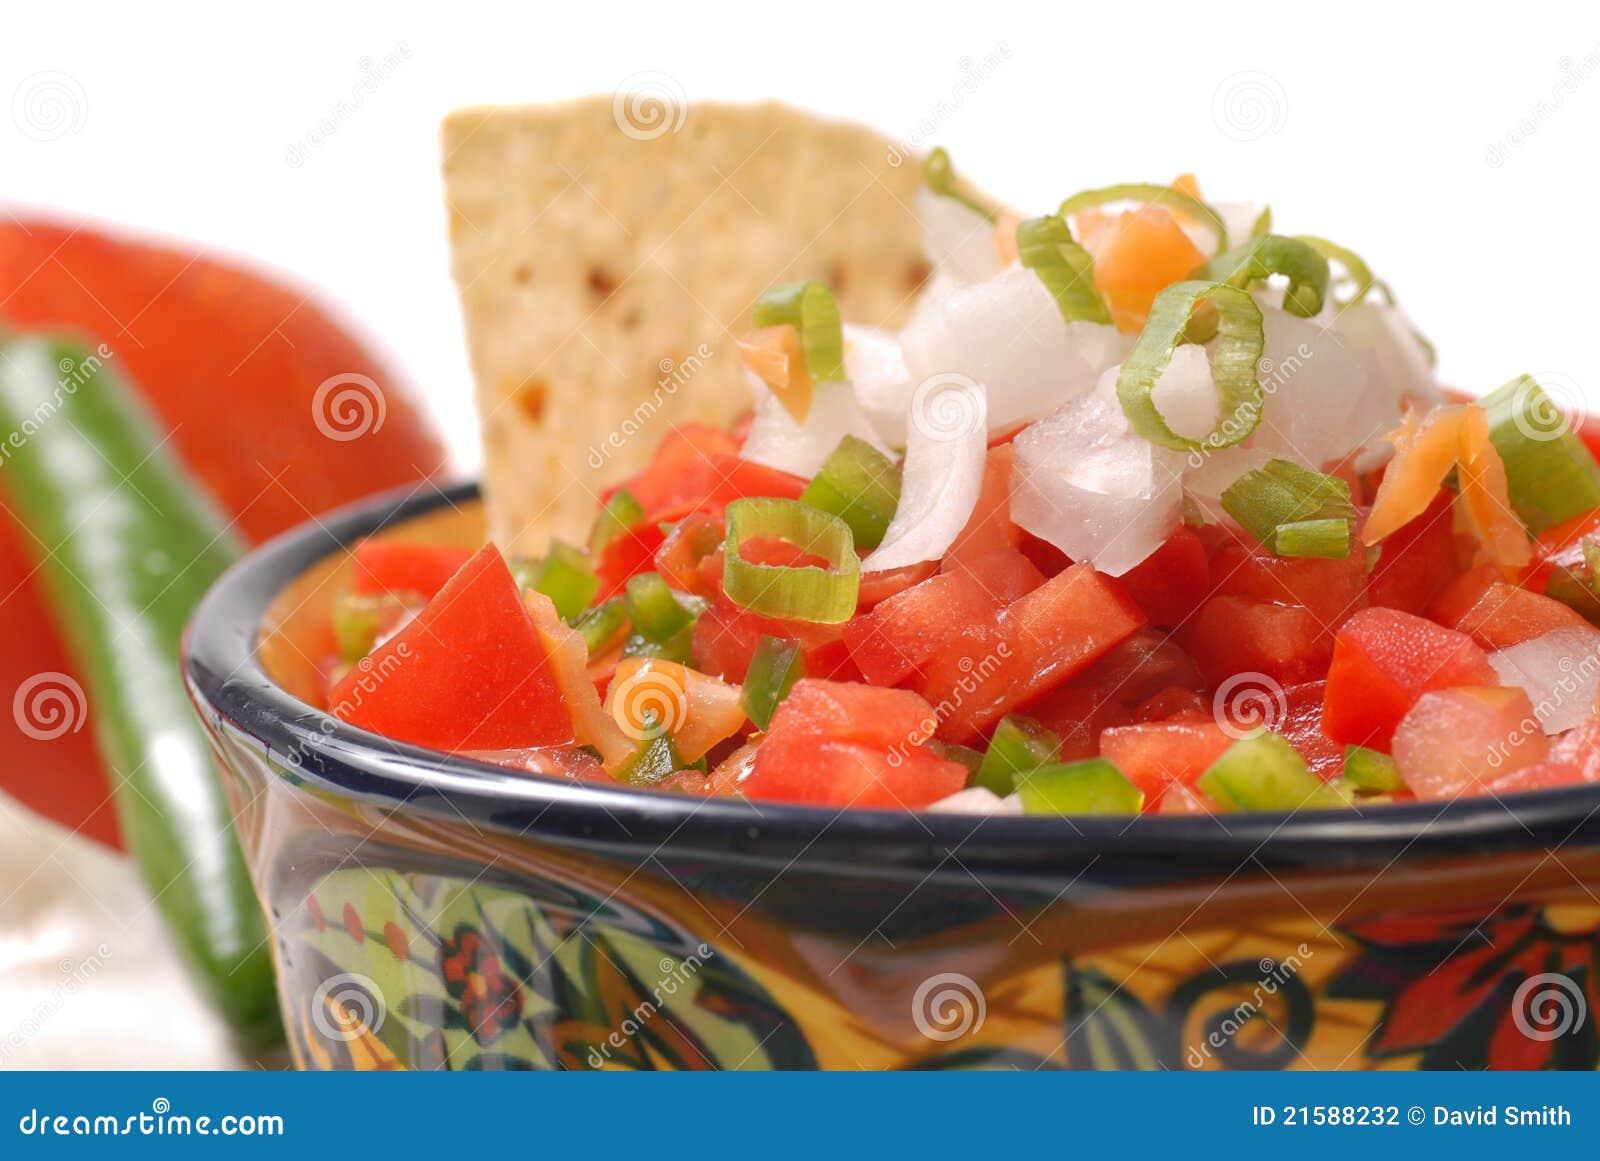 Salsa épicé avec des puces de tortilla